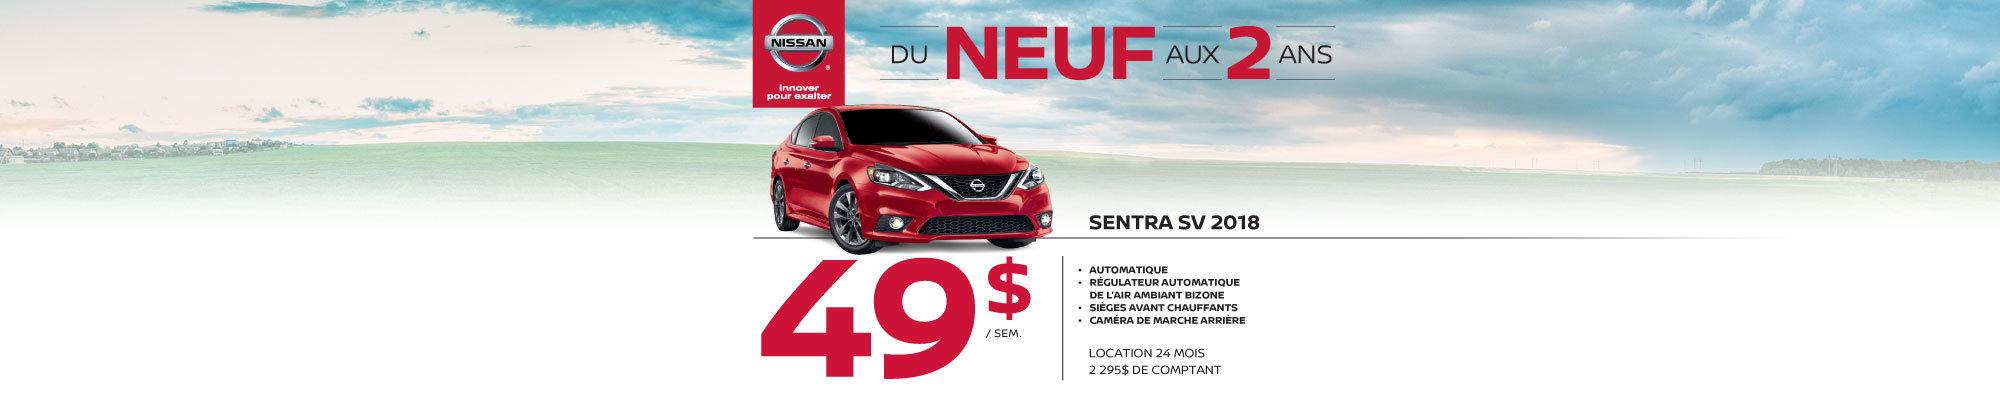 Nissan Sentra 2018 web